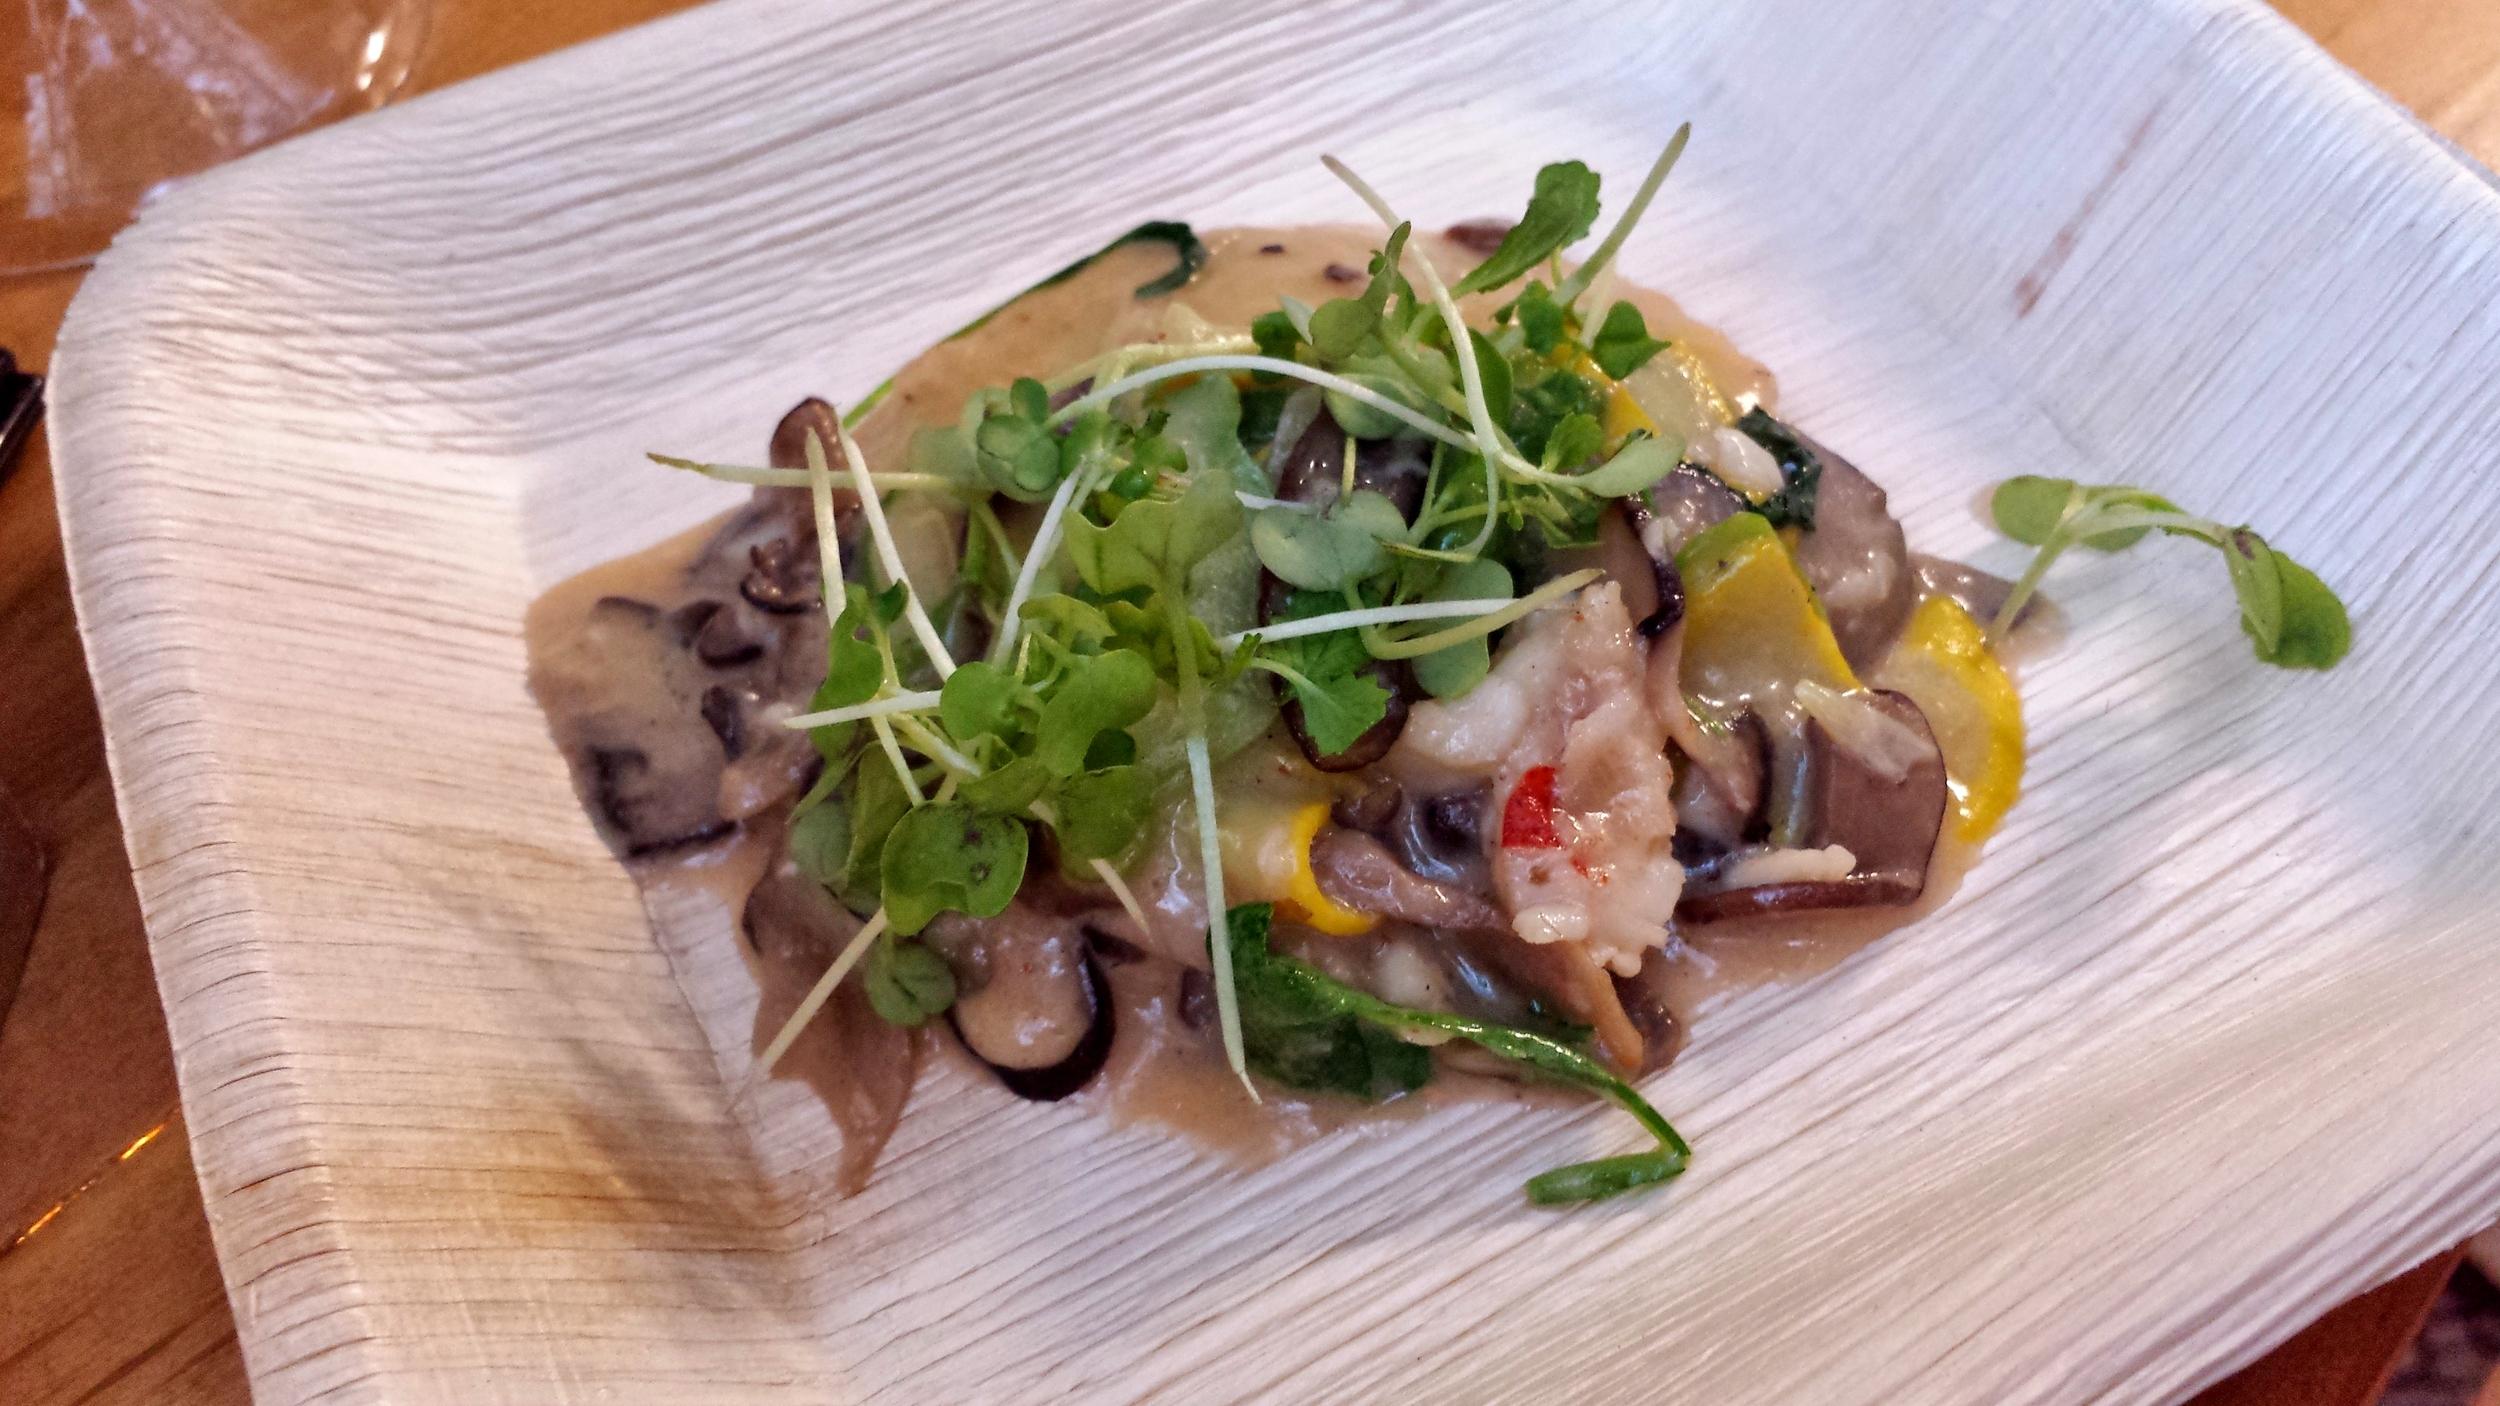 Talavera's ravioli with mushroom and lobster ragout